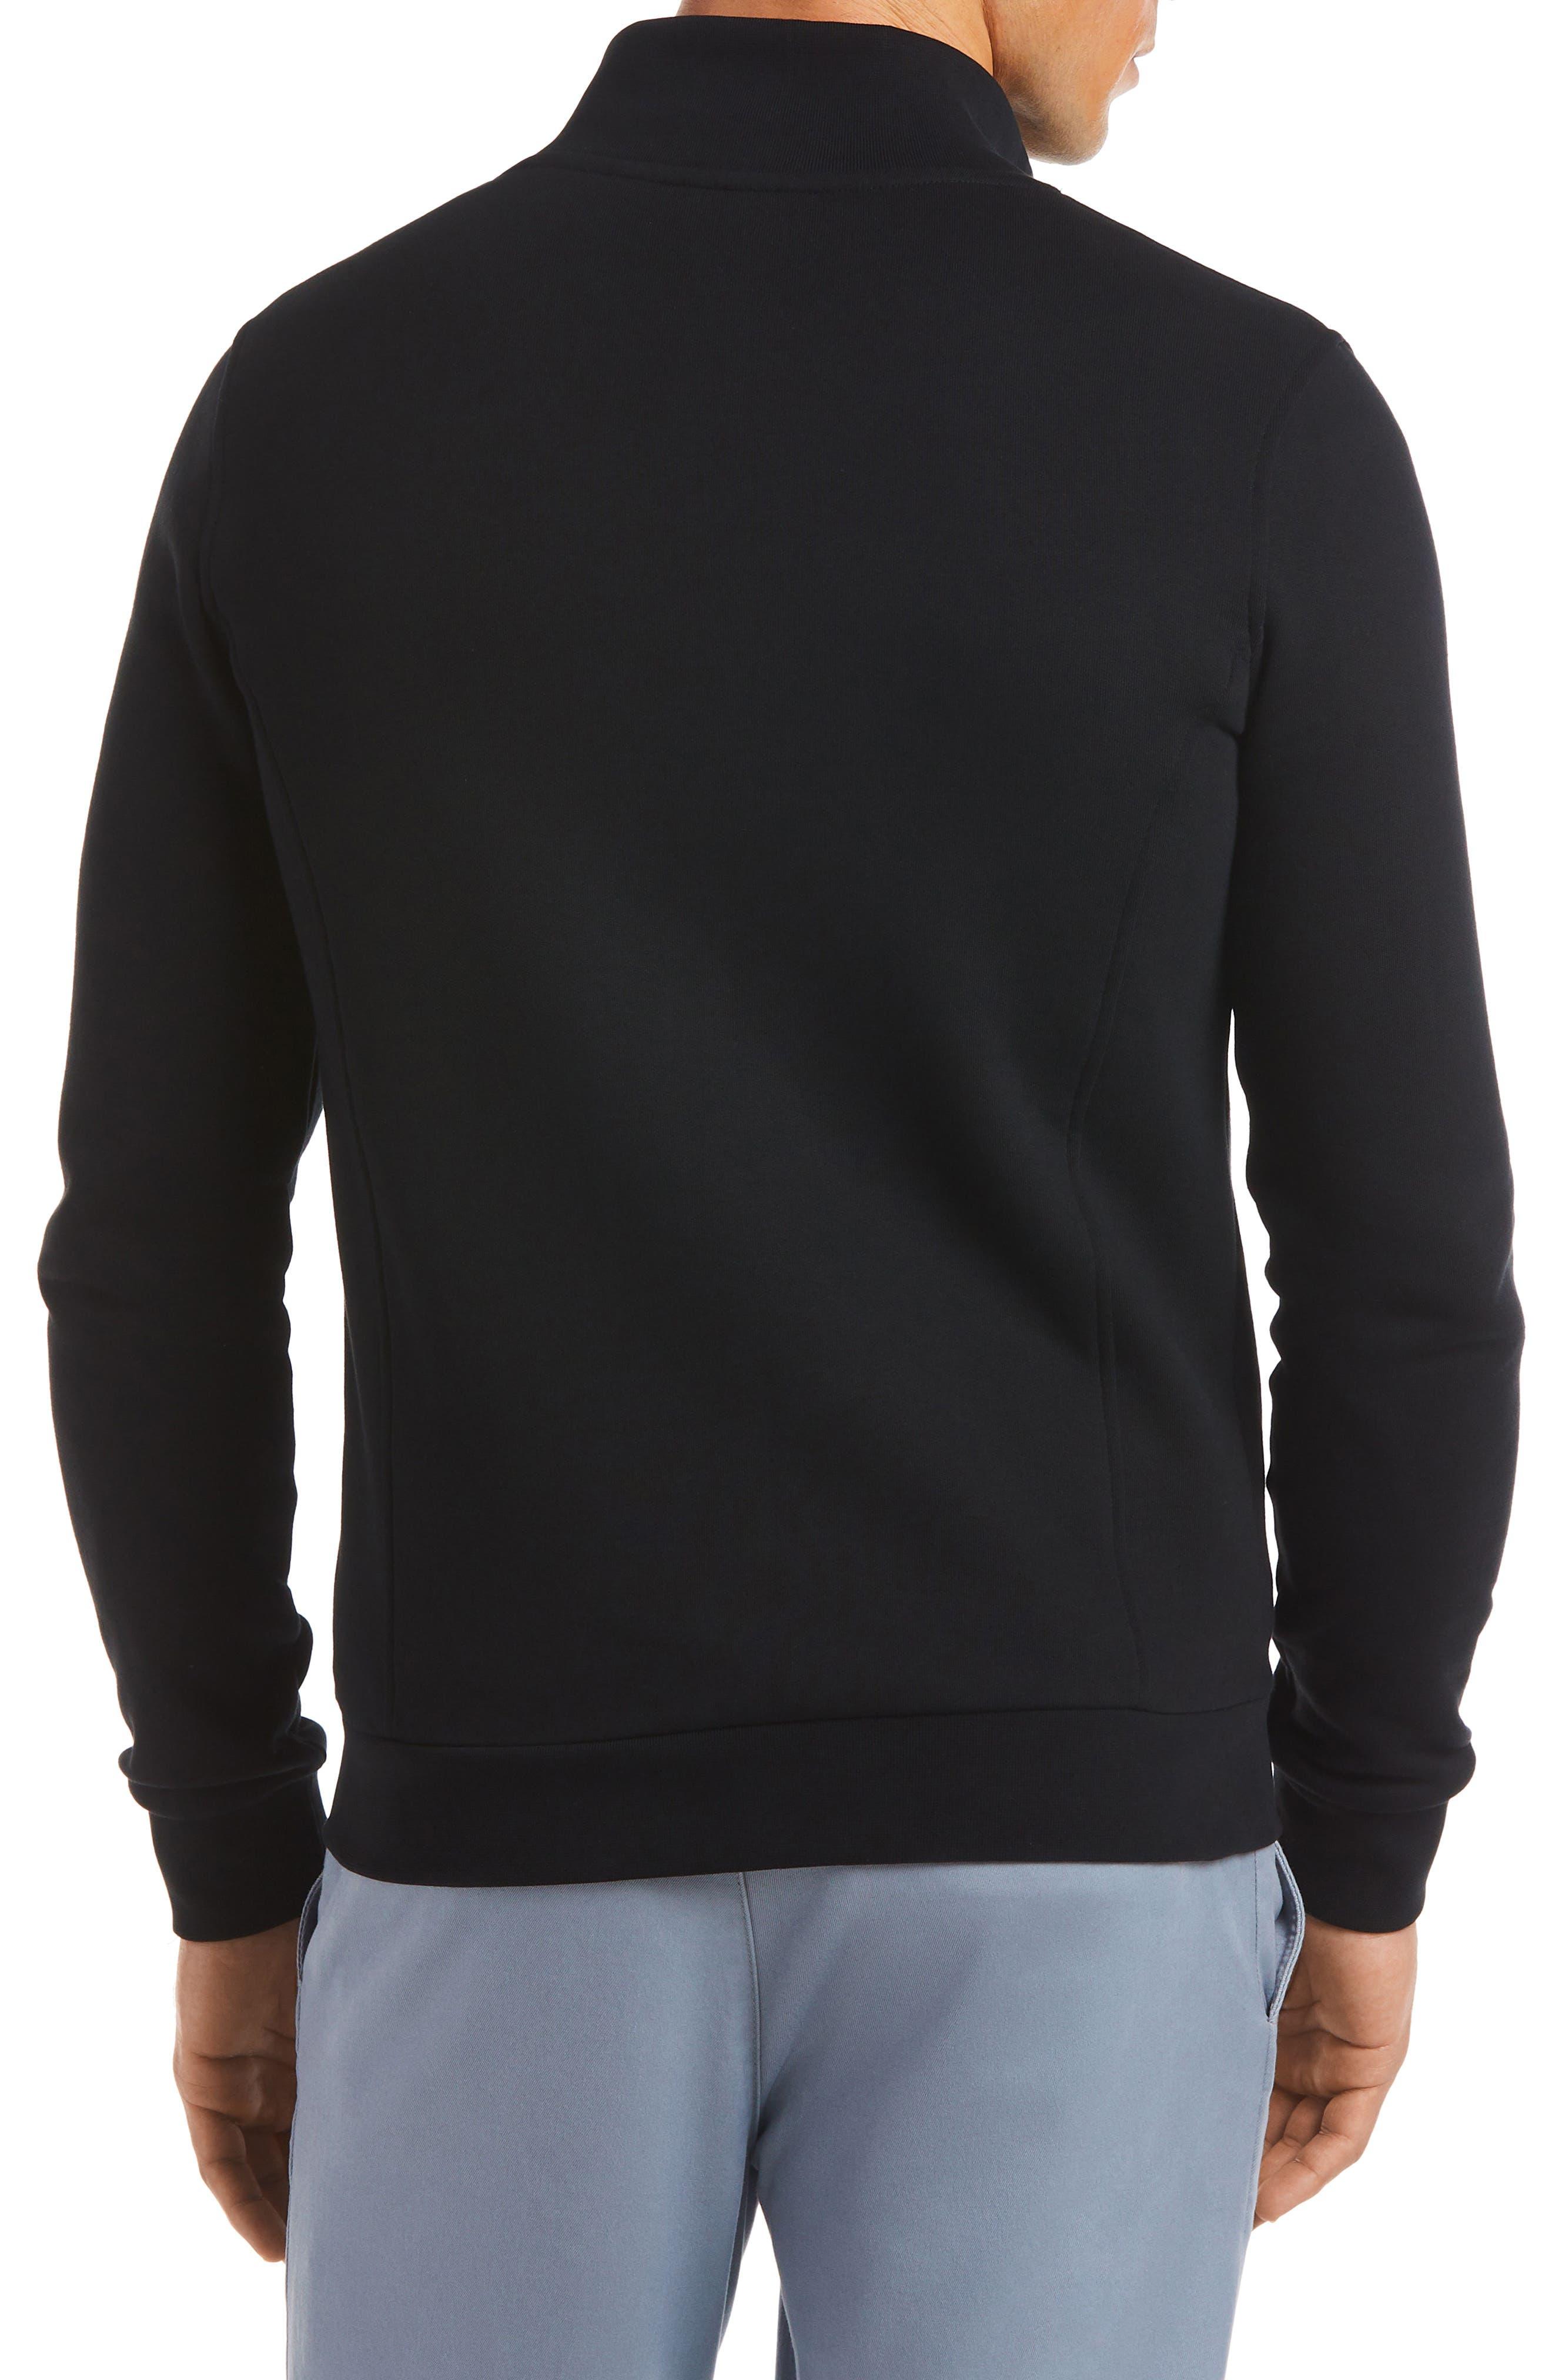 LACOSTE, Fleece Zip Jacket, Alternate thumbnail 2, color, 001